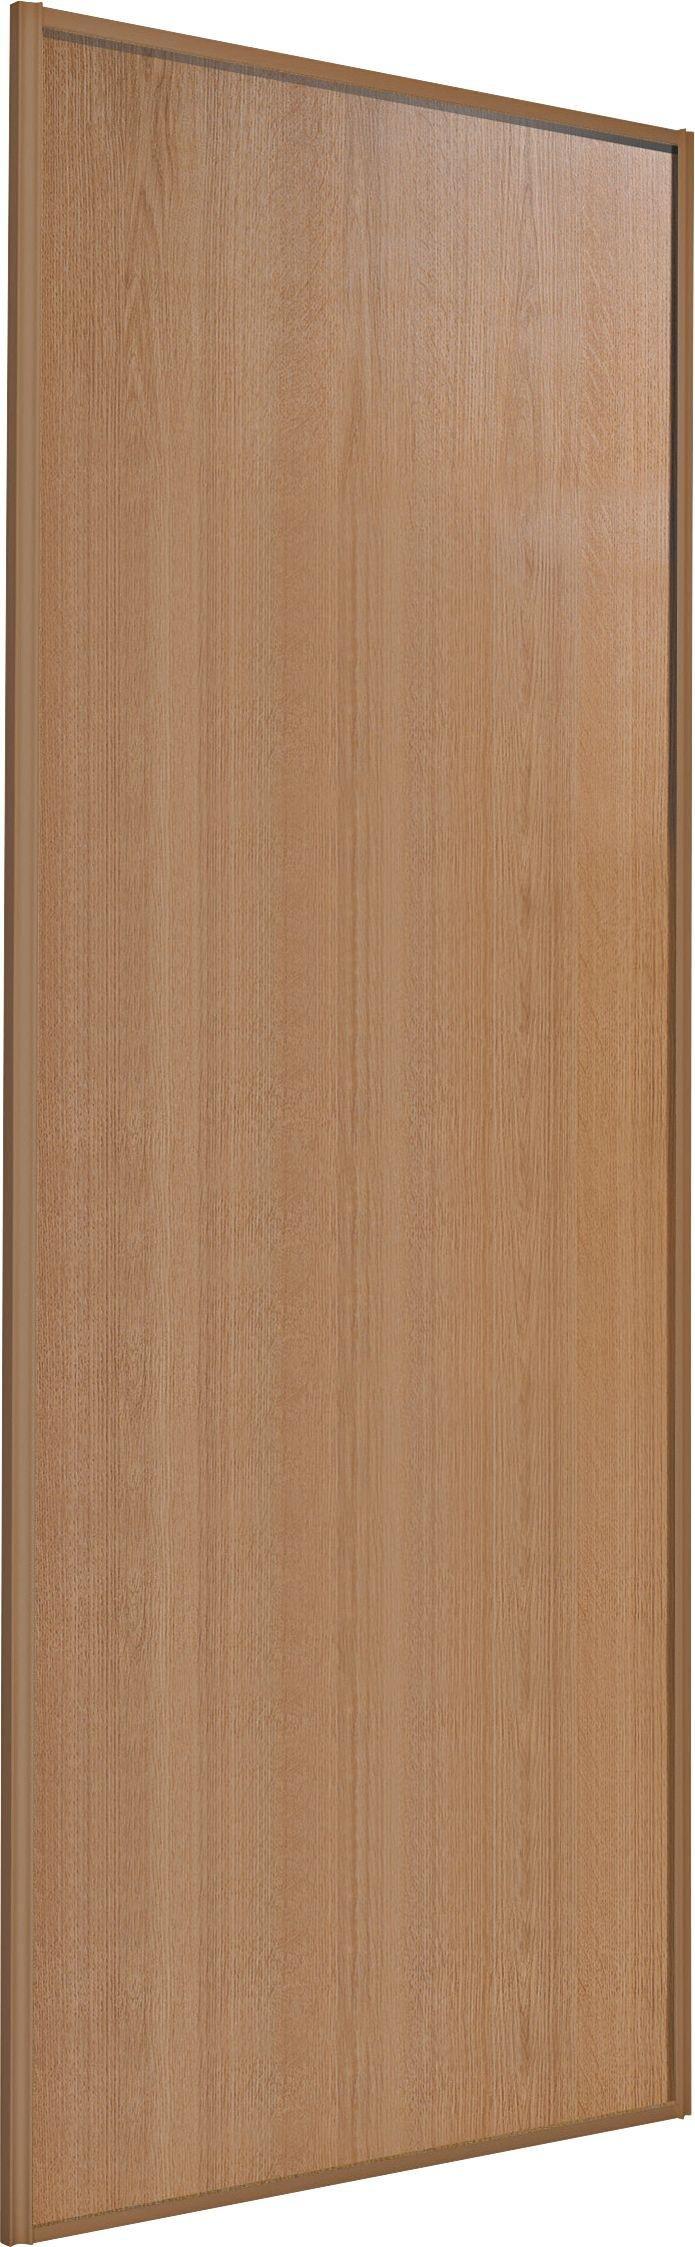 Sliding Wardrobe Door W762mm Oak Panel